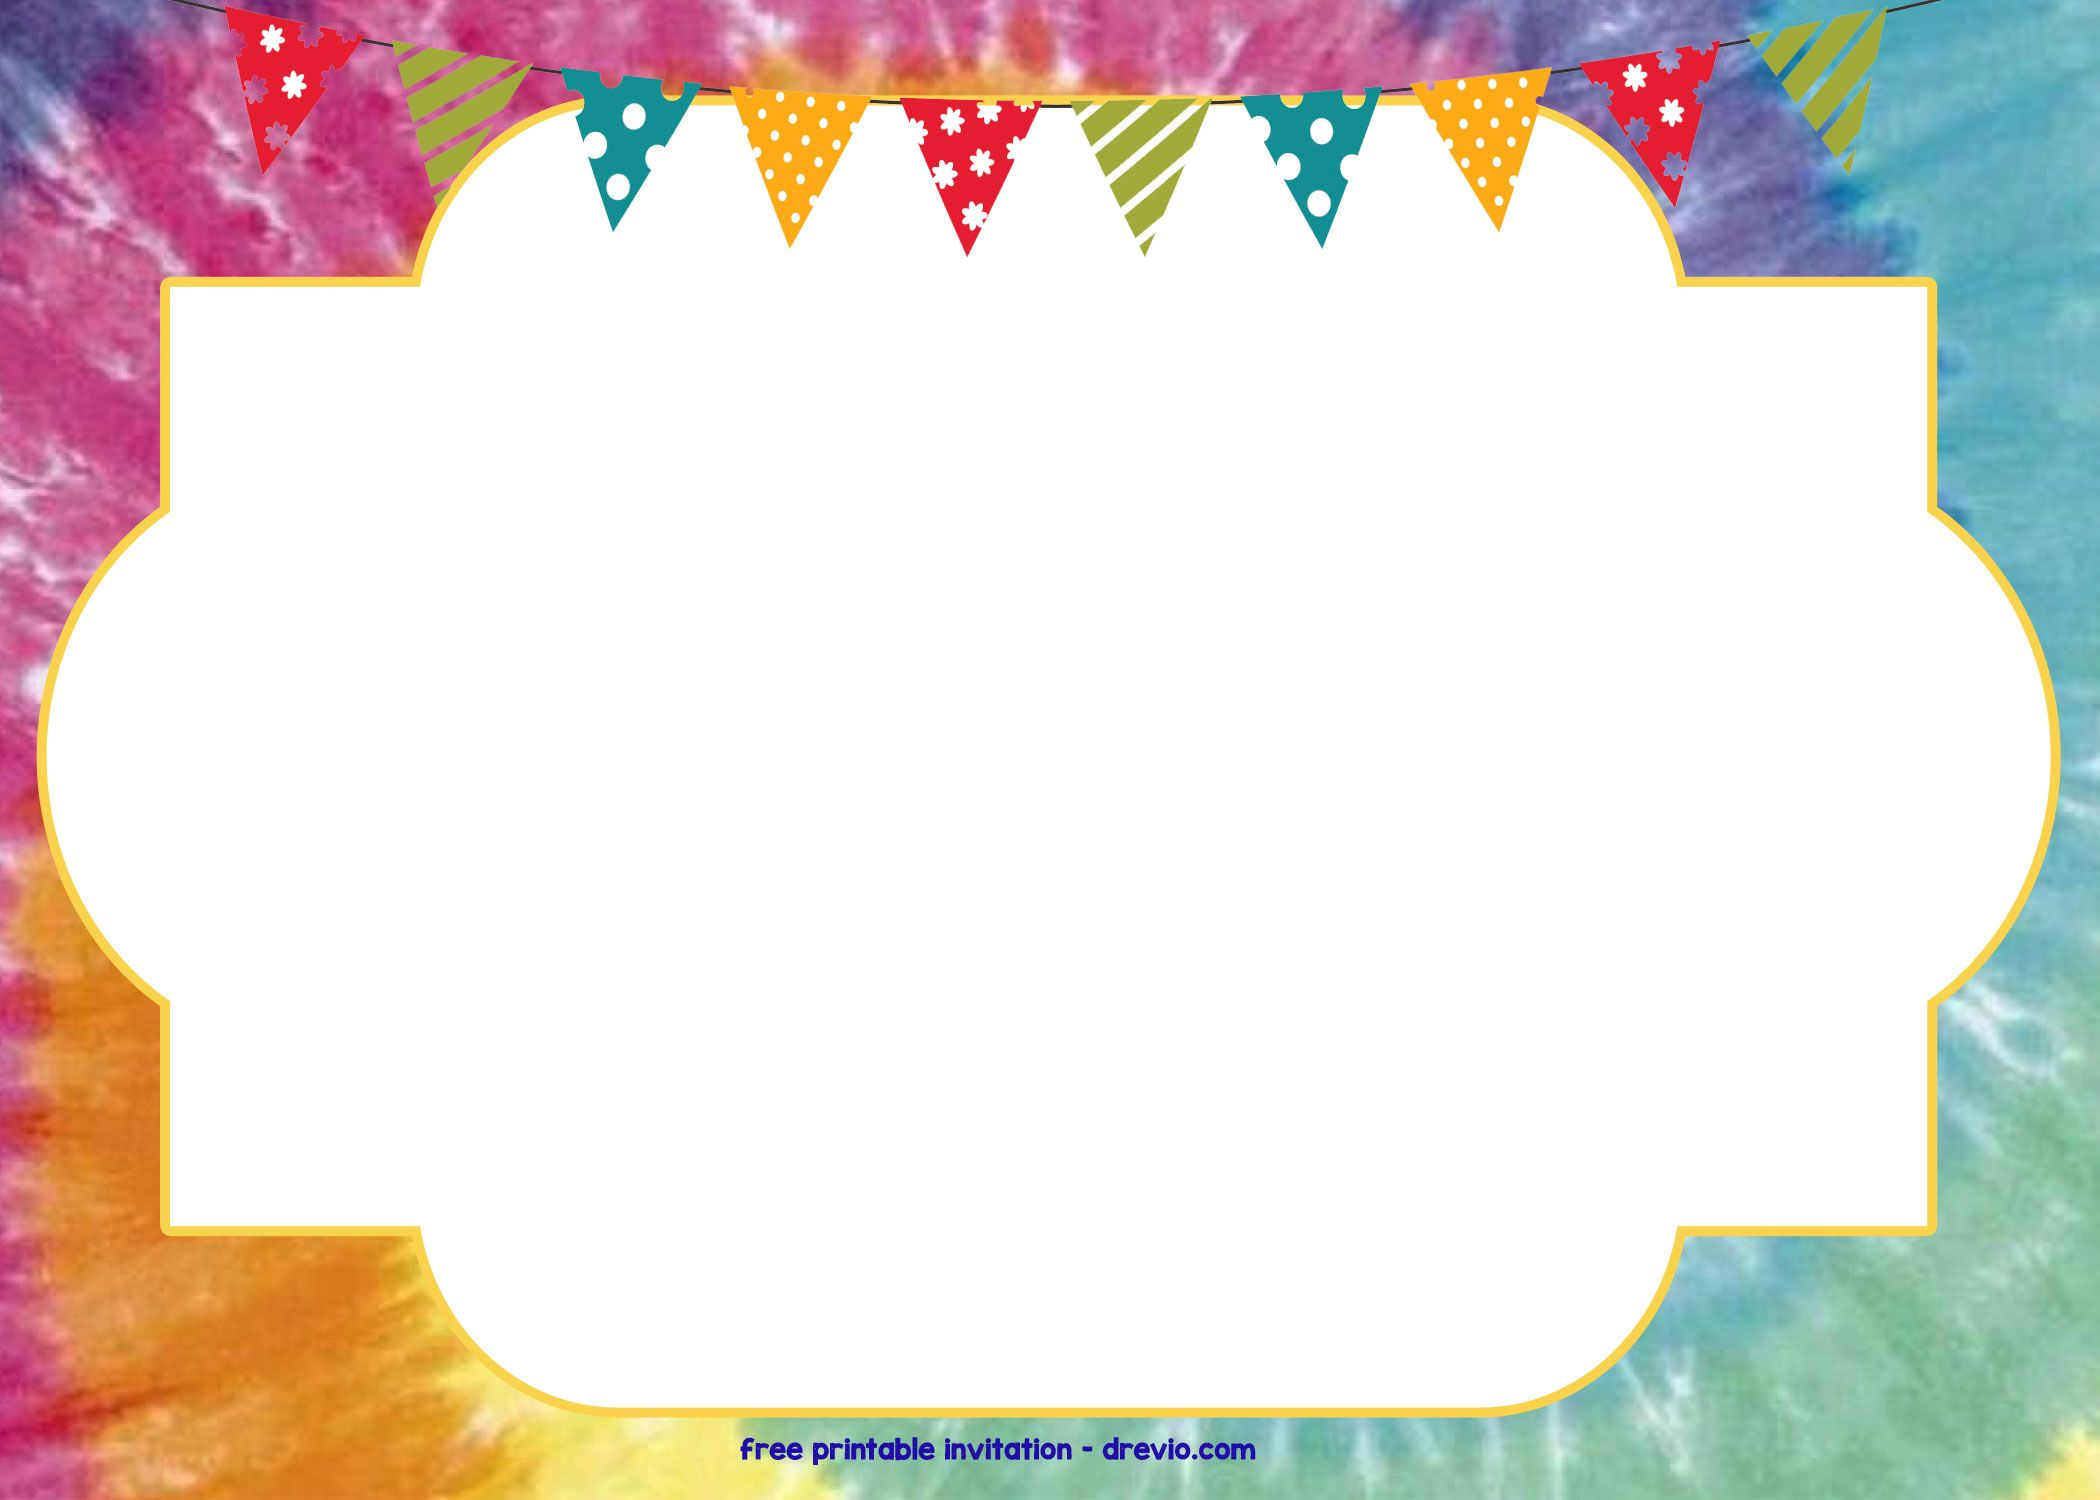 Free Tie Dye Invitation Template Free Printable Birthday